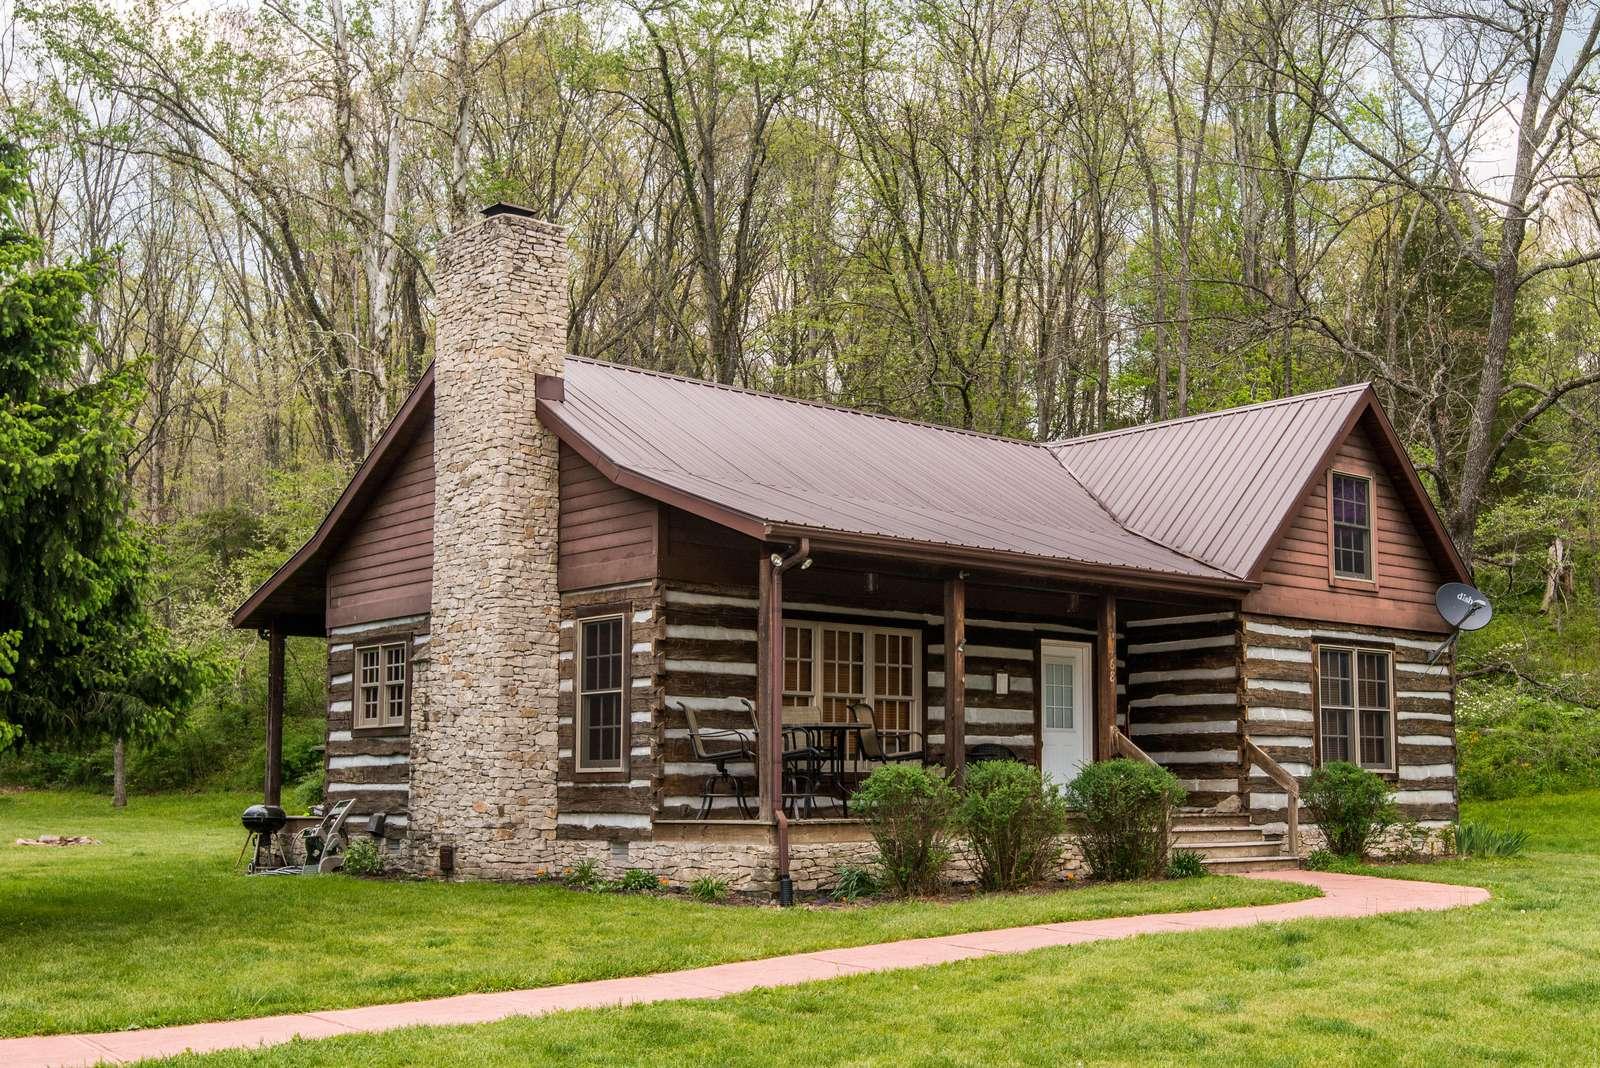 Serendipity Park Log Cabin - property